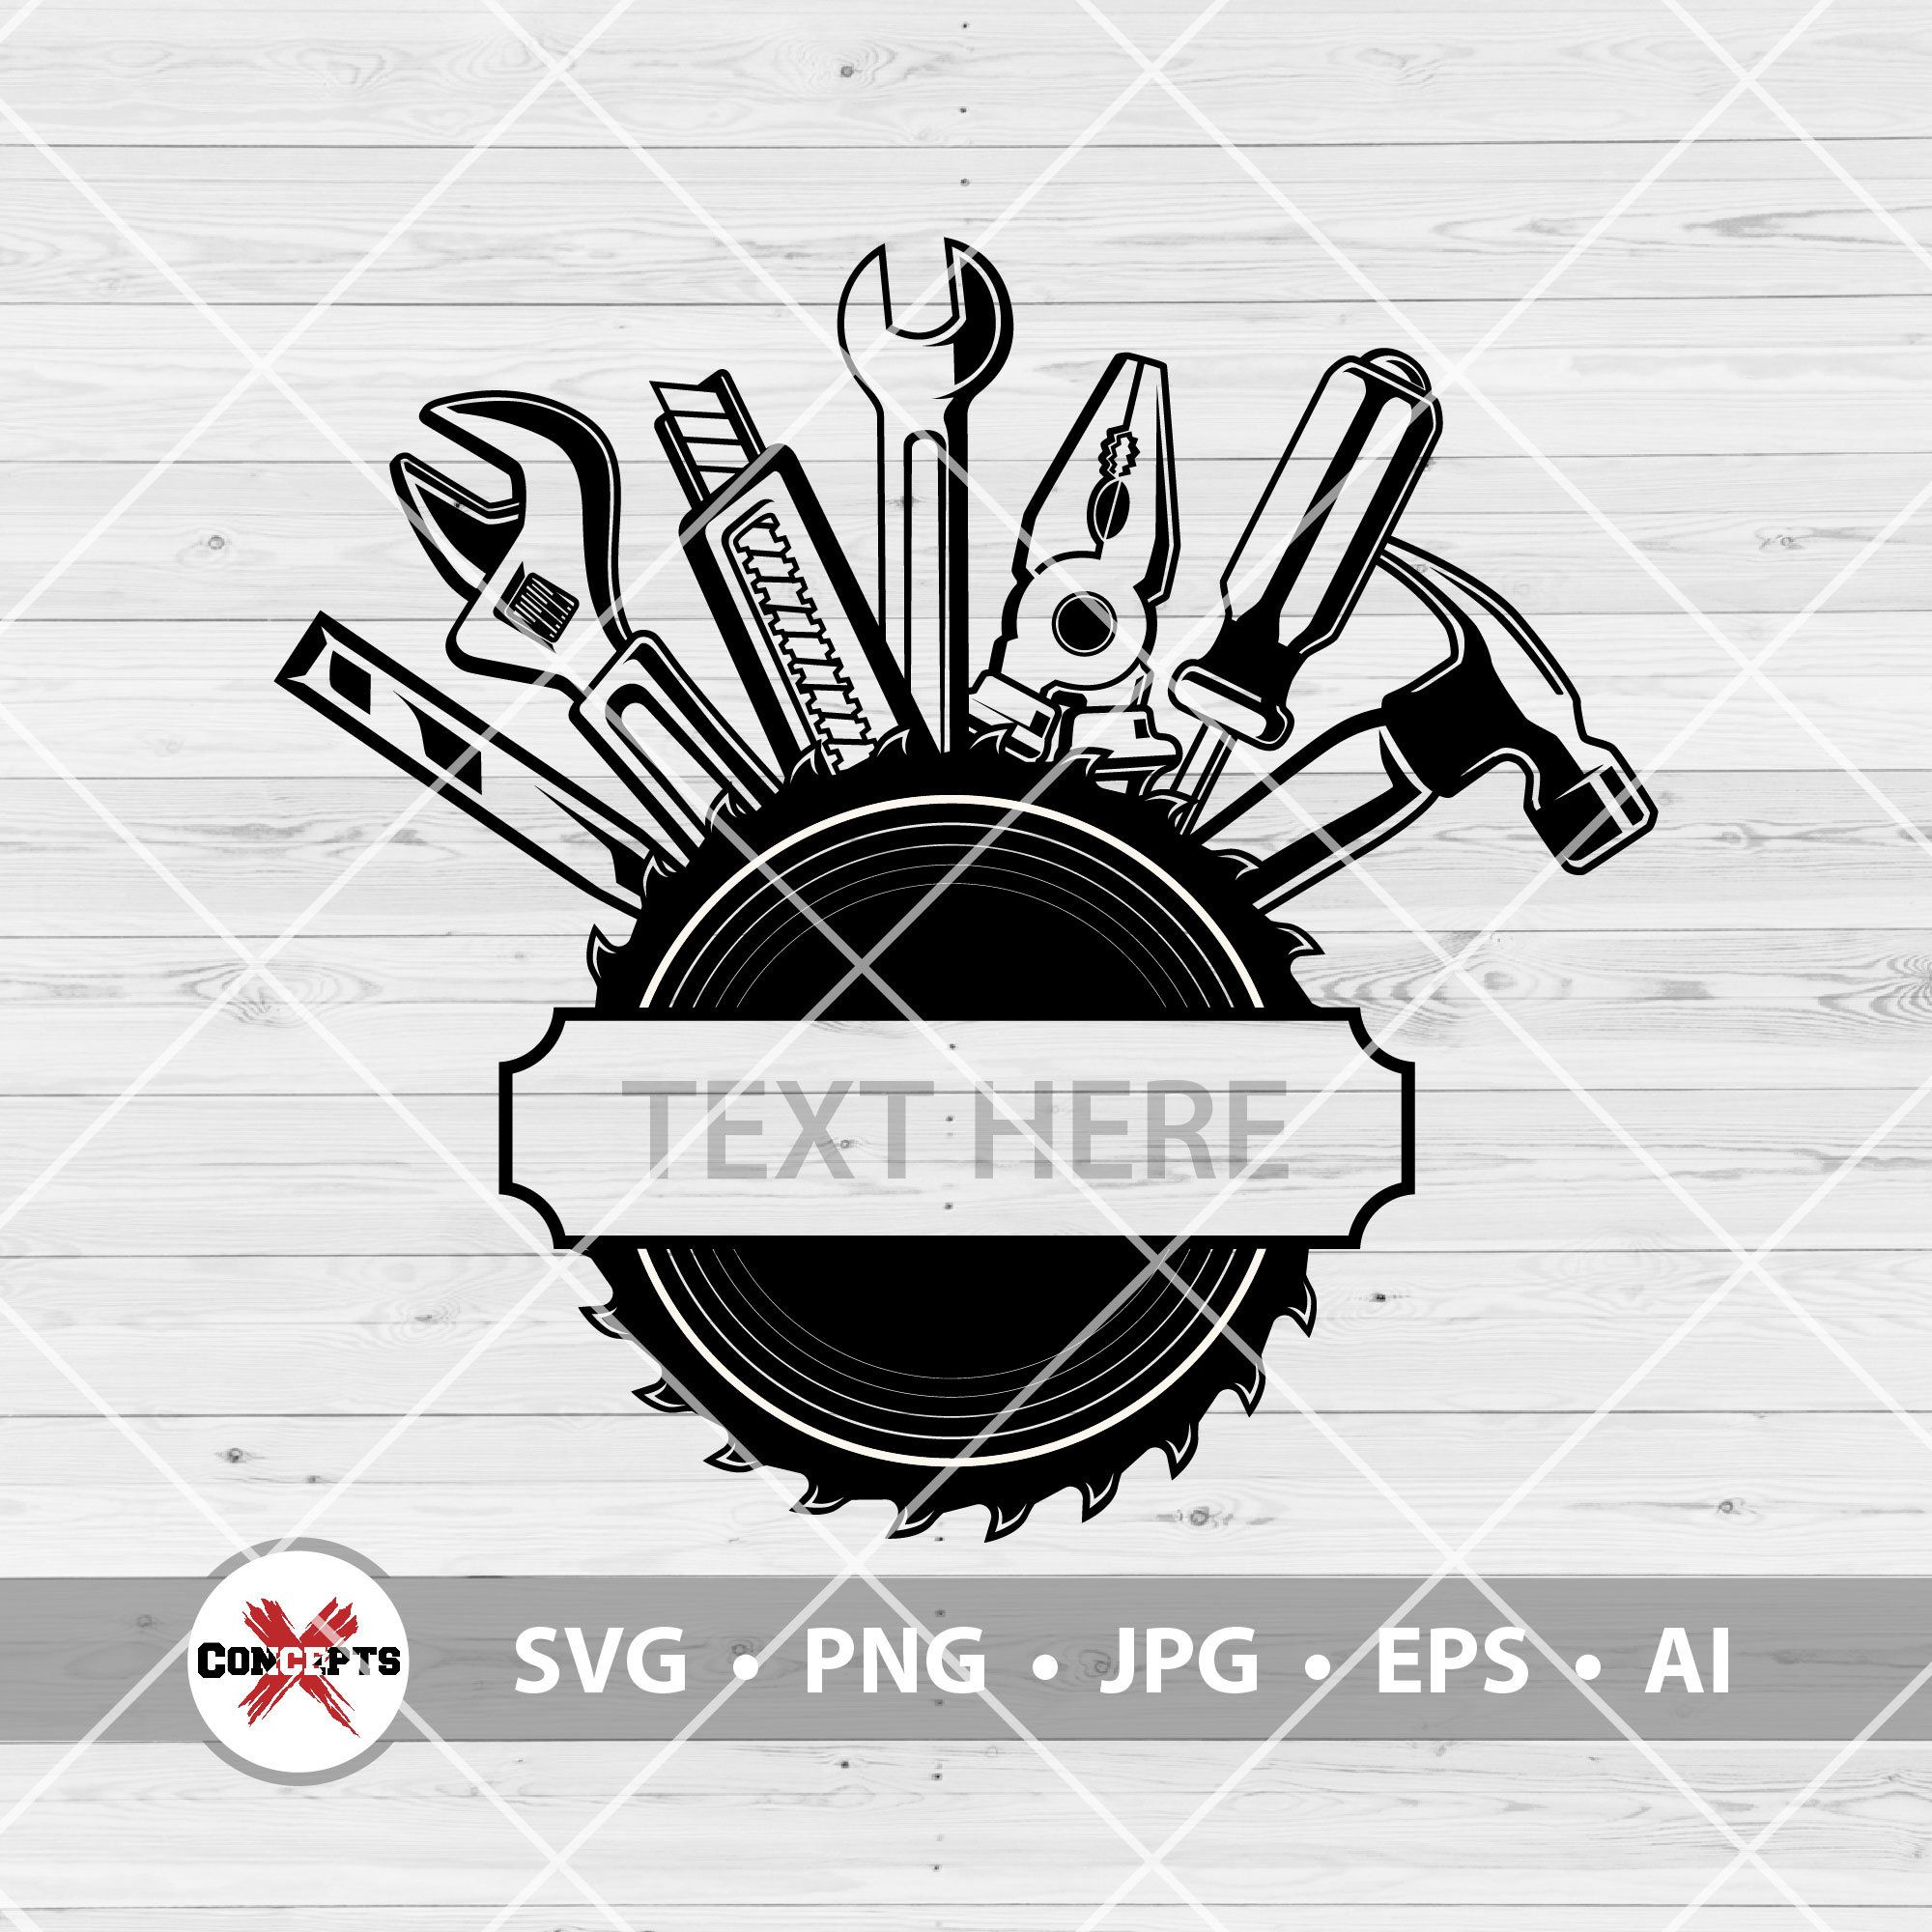 Repair Tools Svg Tool Box Svg Tools Svg Handyman Svg Tools Etsy Tool Box Svg Carpenter Tools